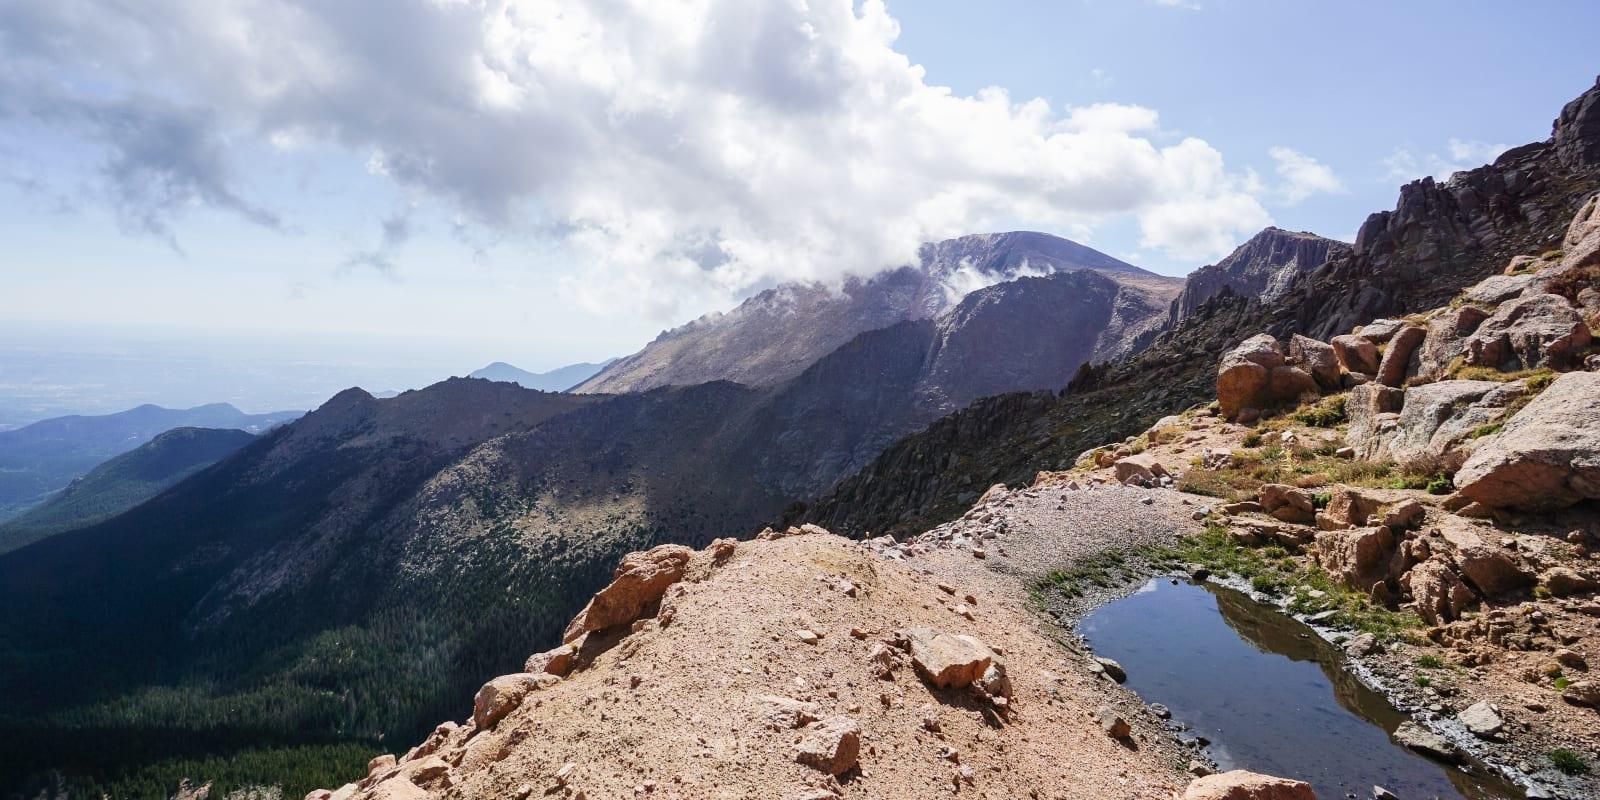 Pikes Peak Colorado